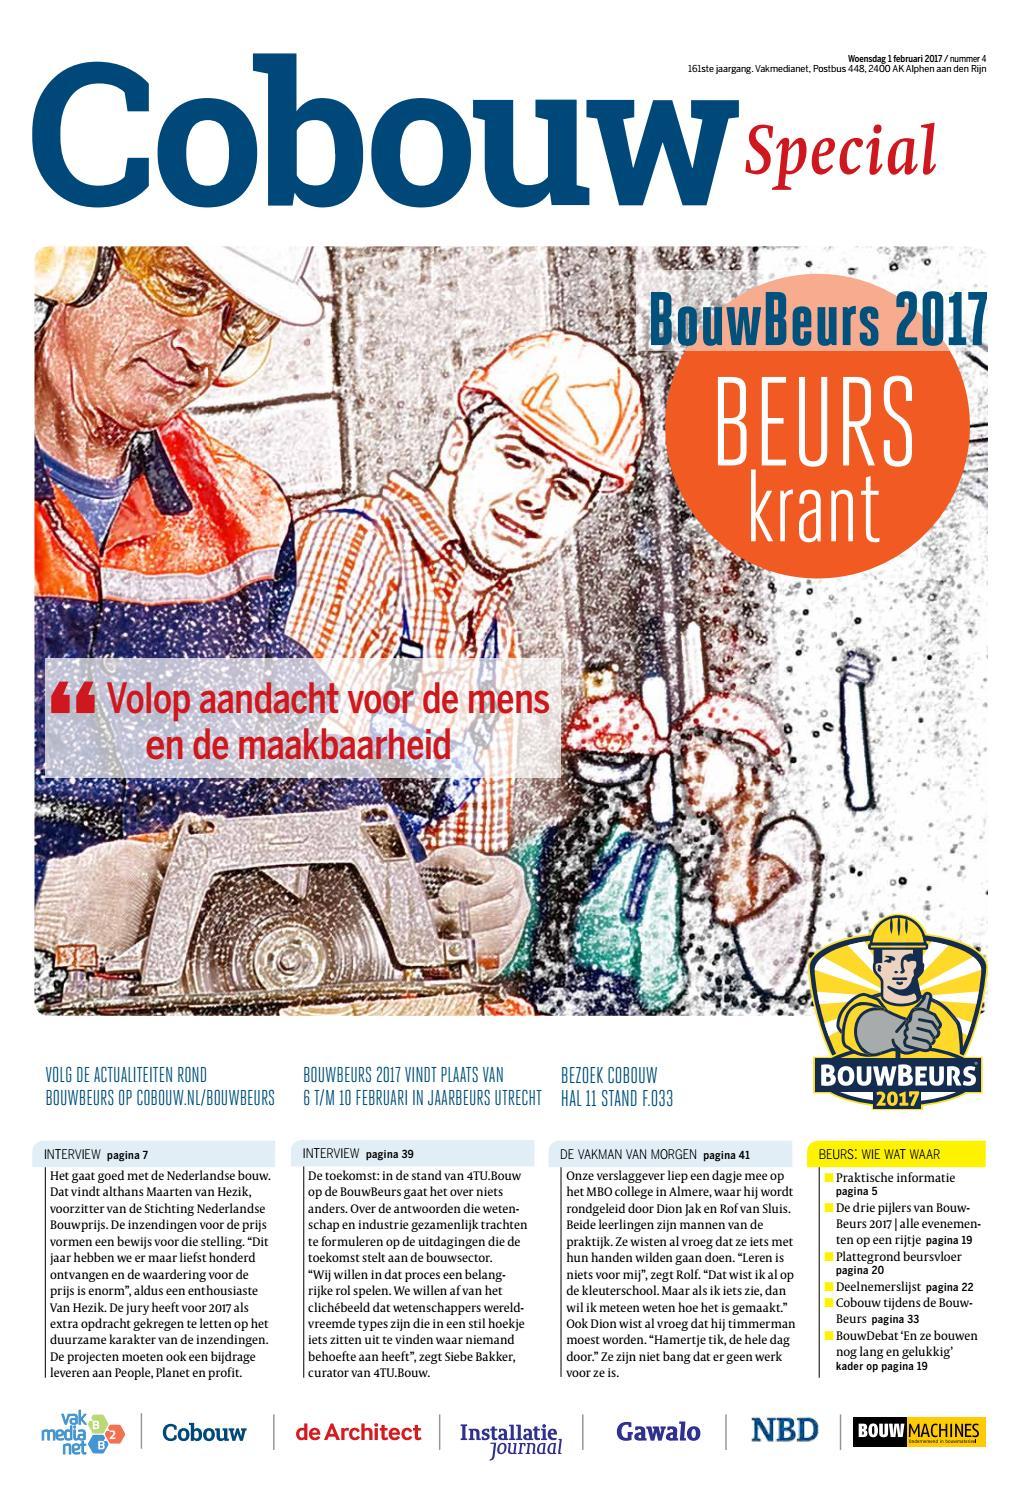 Bouwbeurs krant by cobouwspecials issuu for Bouwbeurs utrecht 2017